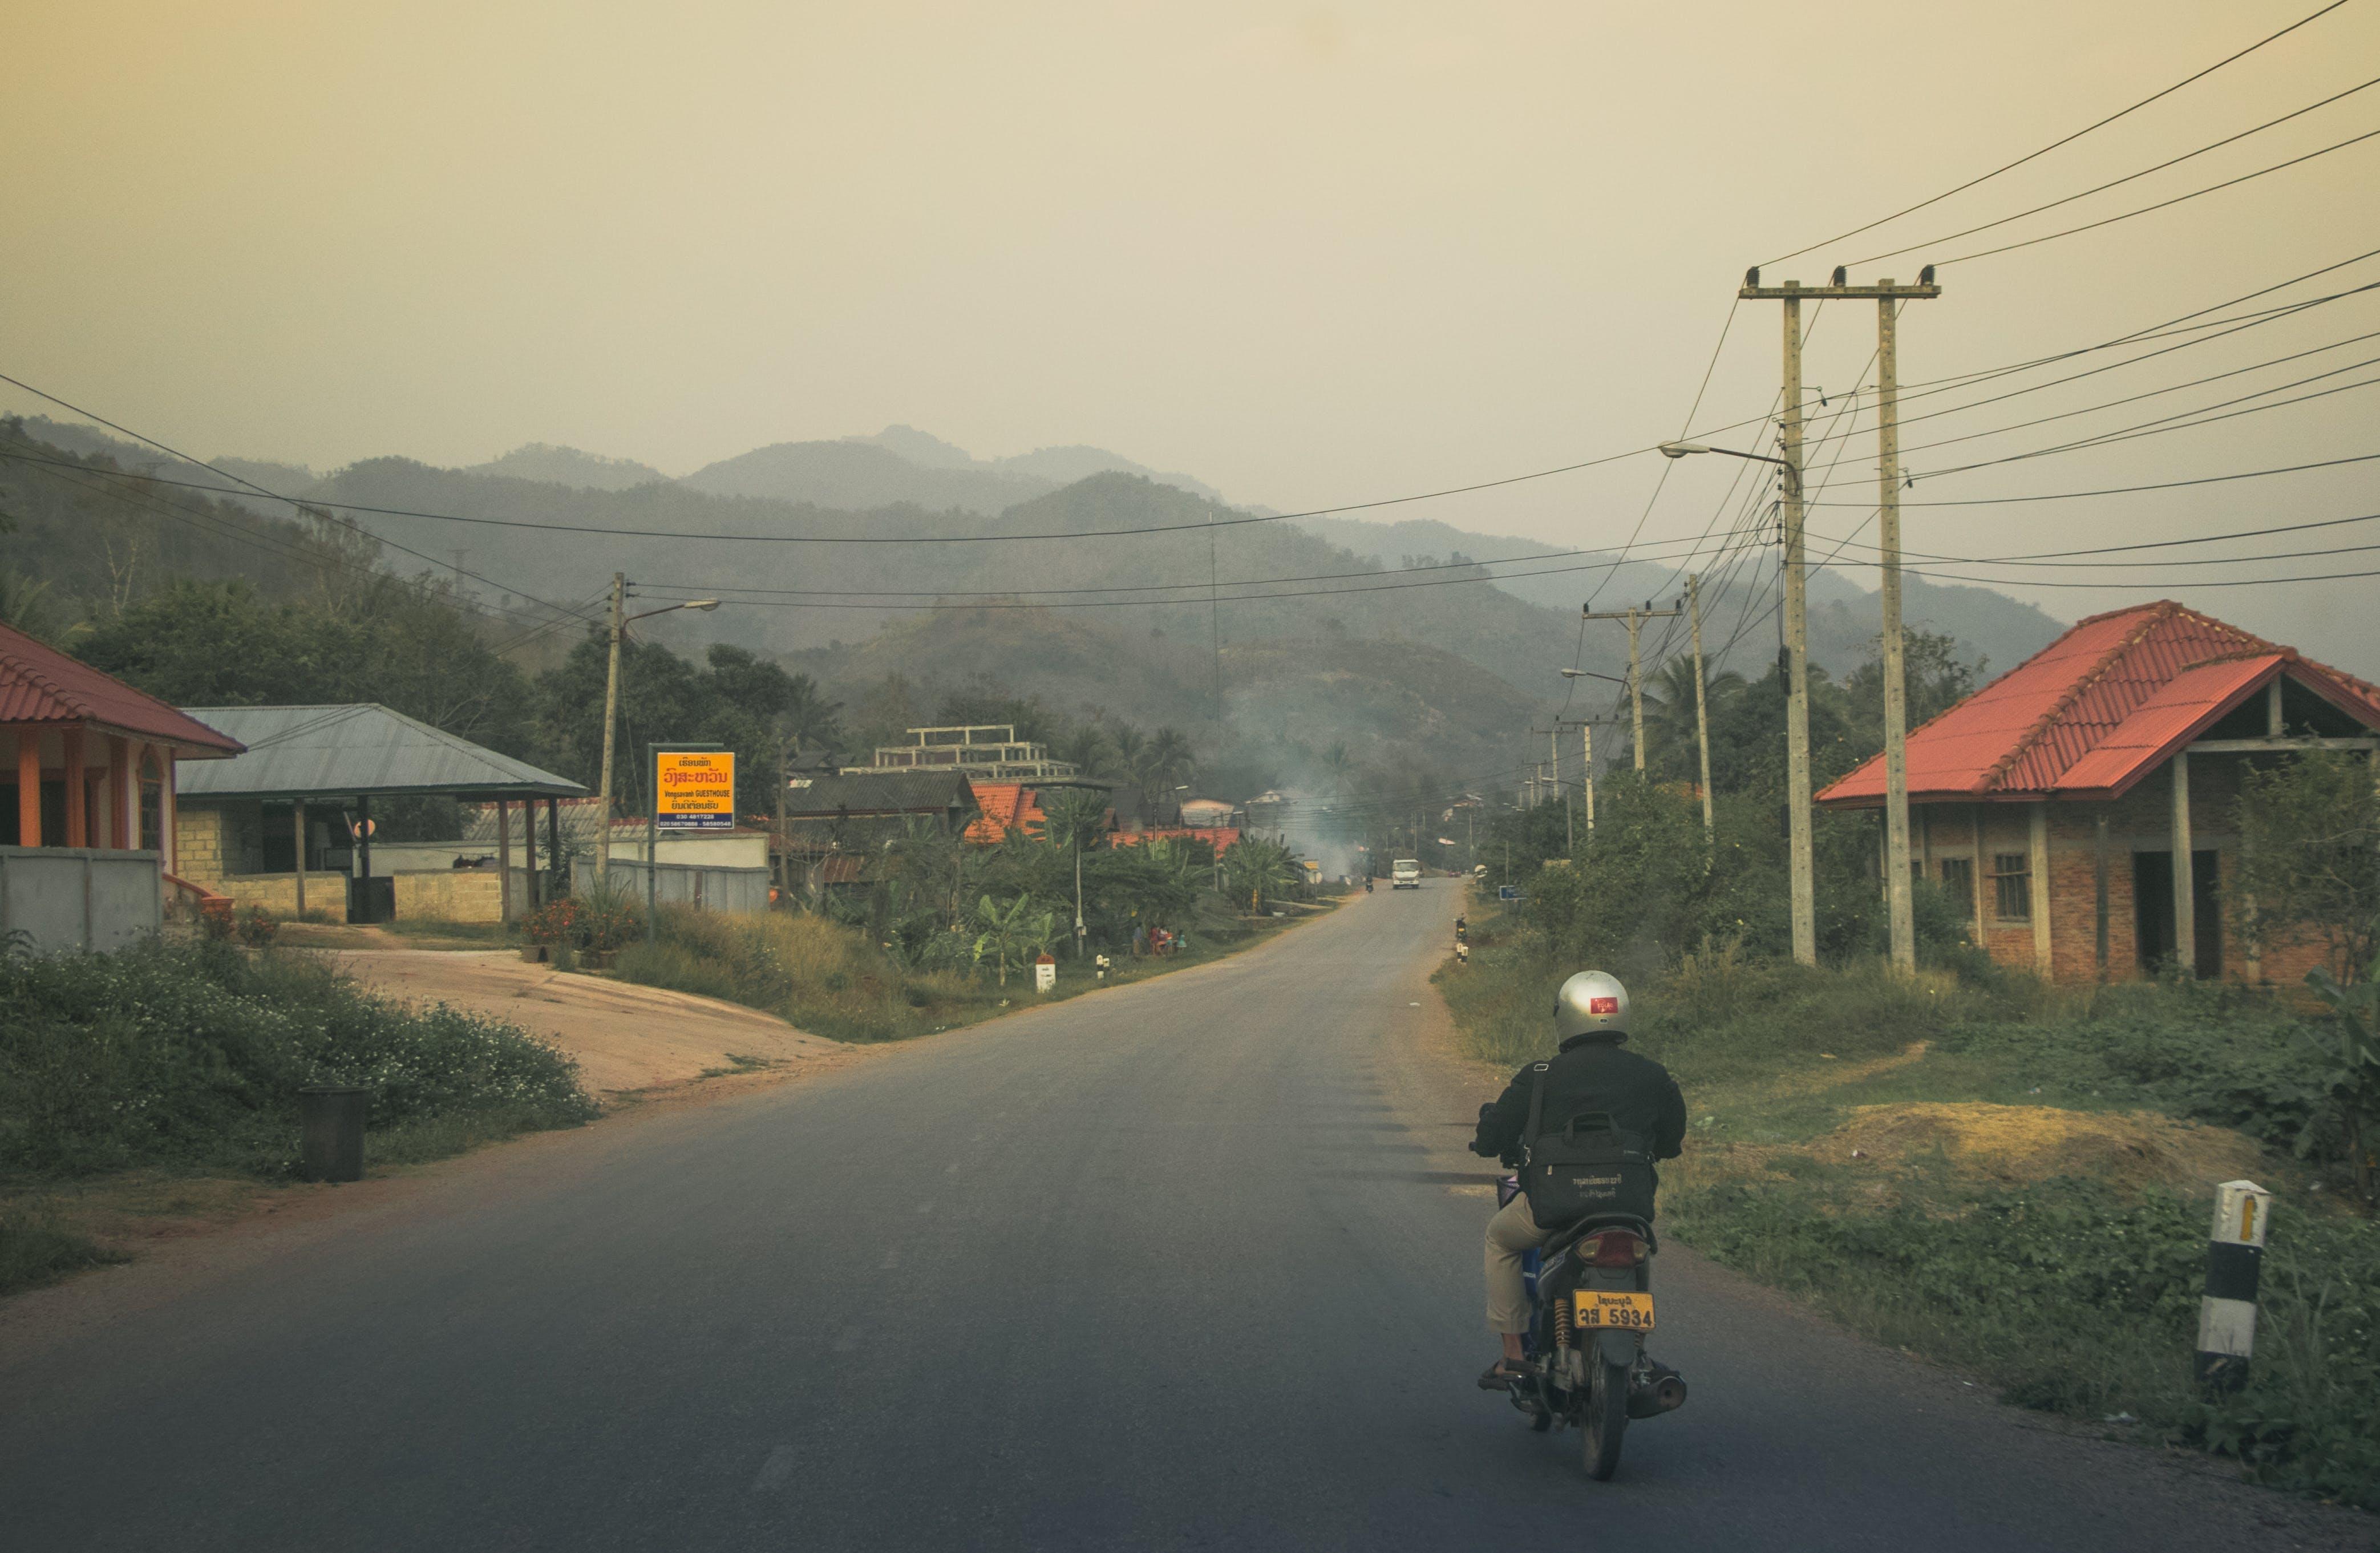 Free stock photo of asia, Asian, Asian View, car